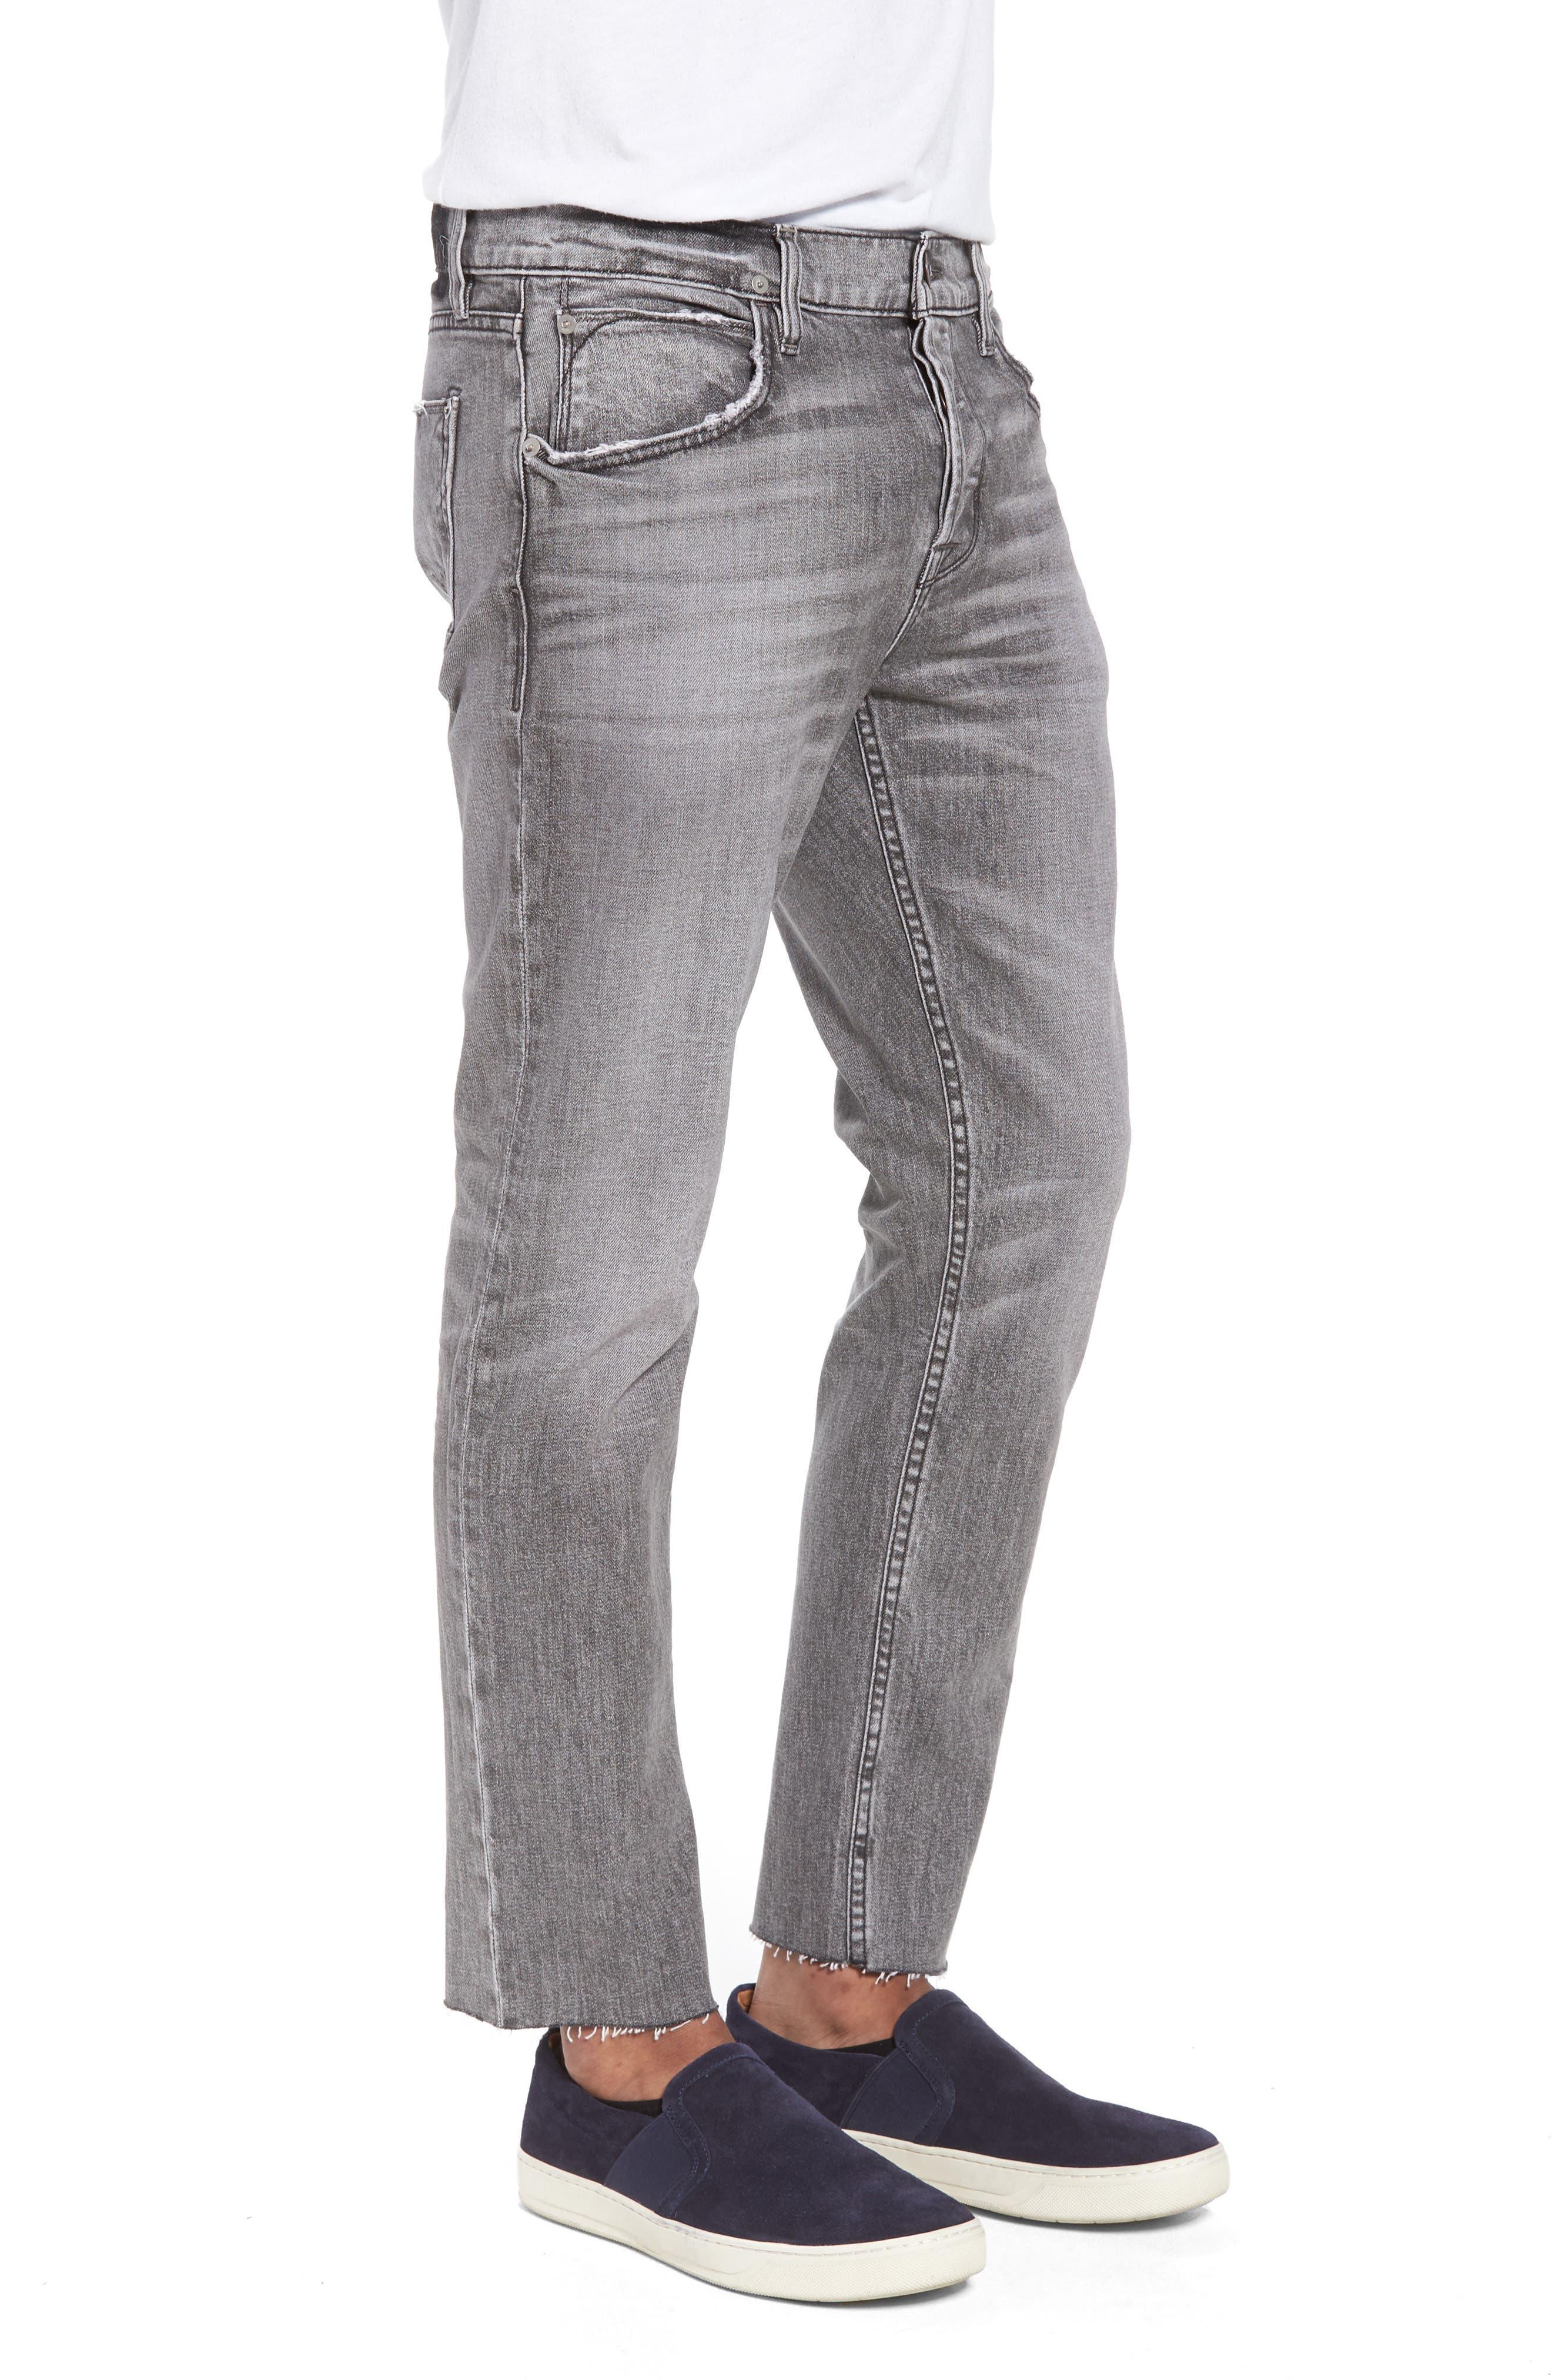 Blake Slim Fit Jeans,                             Alternate thumbnail 3, color,                             Chrome